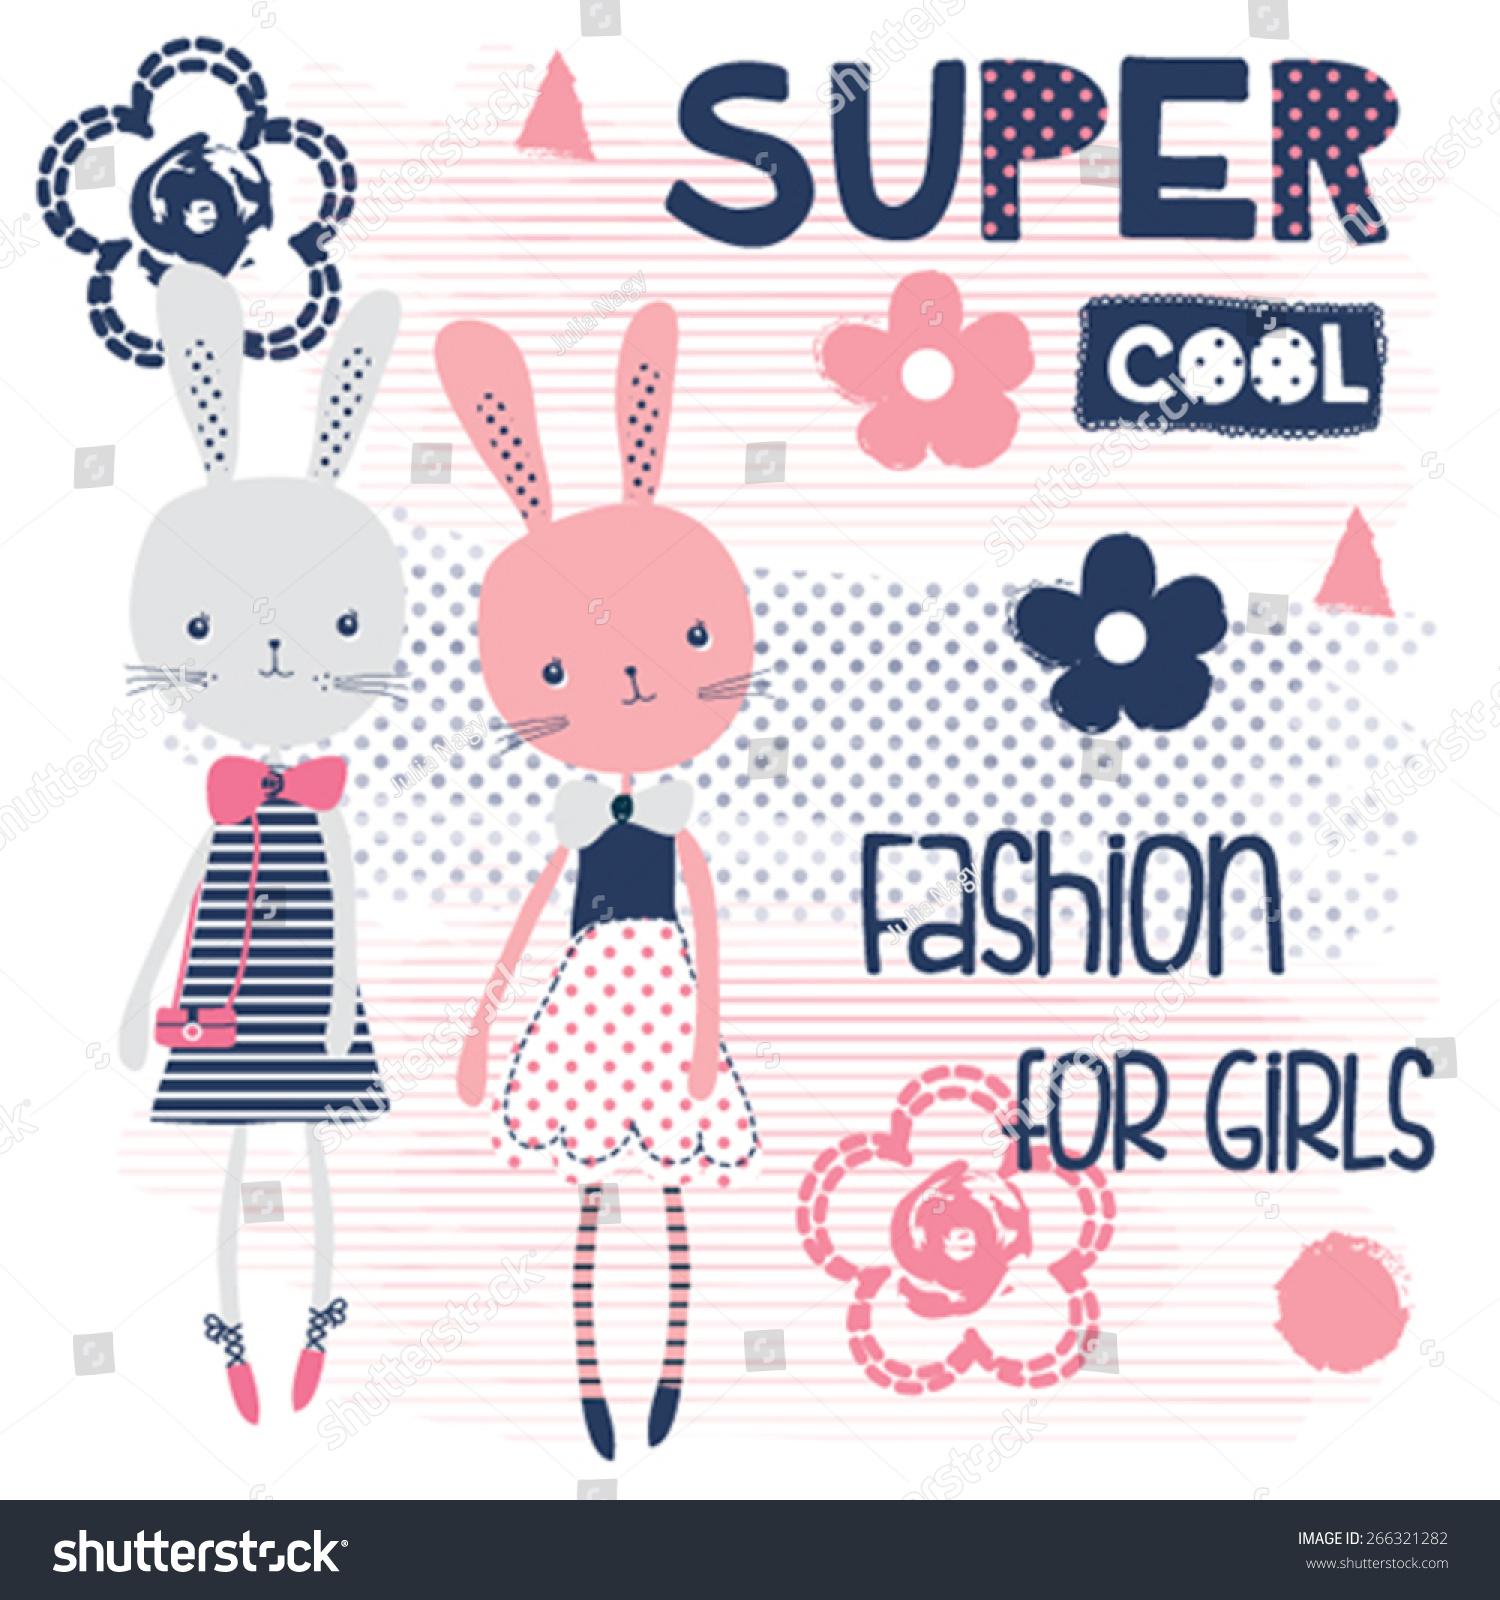 Shirt design in girl - Cute Bunny Girls Fashion For Girls T Shirt Design Vector Illustration Stock Vector